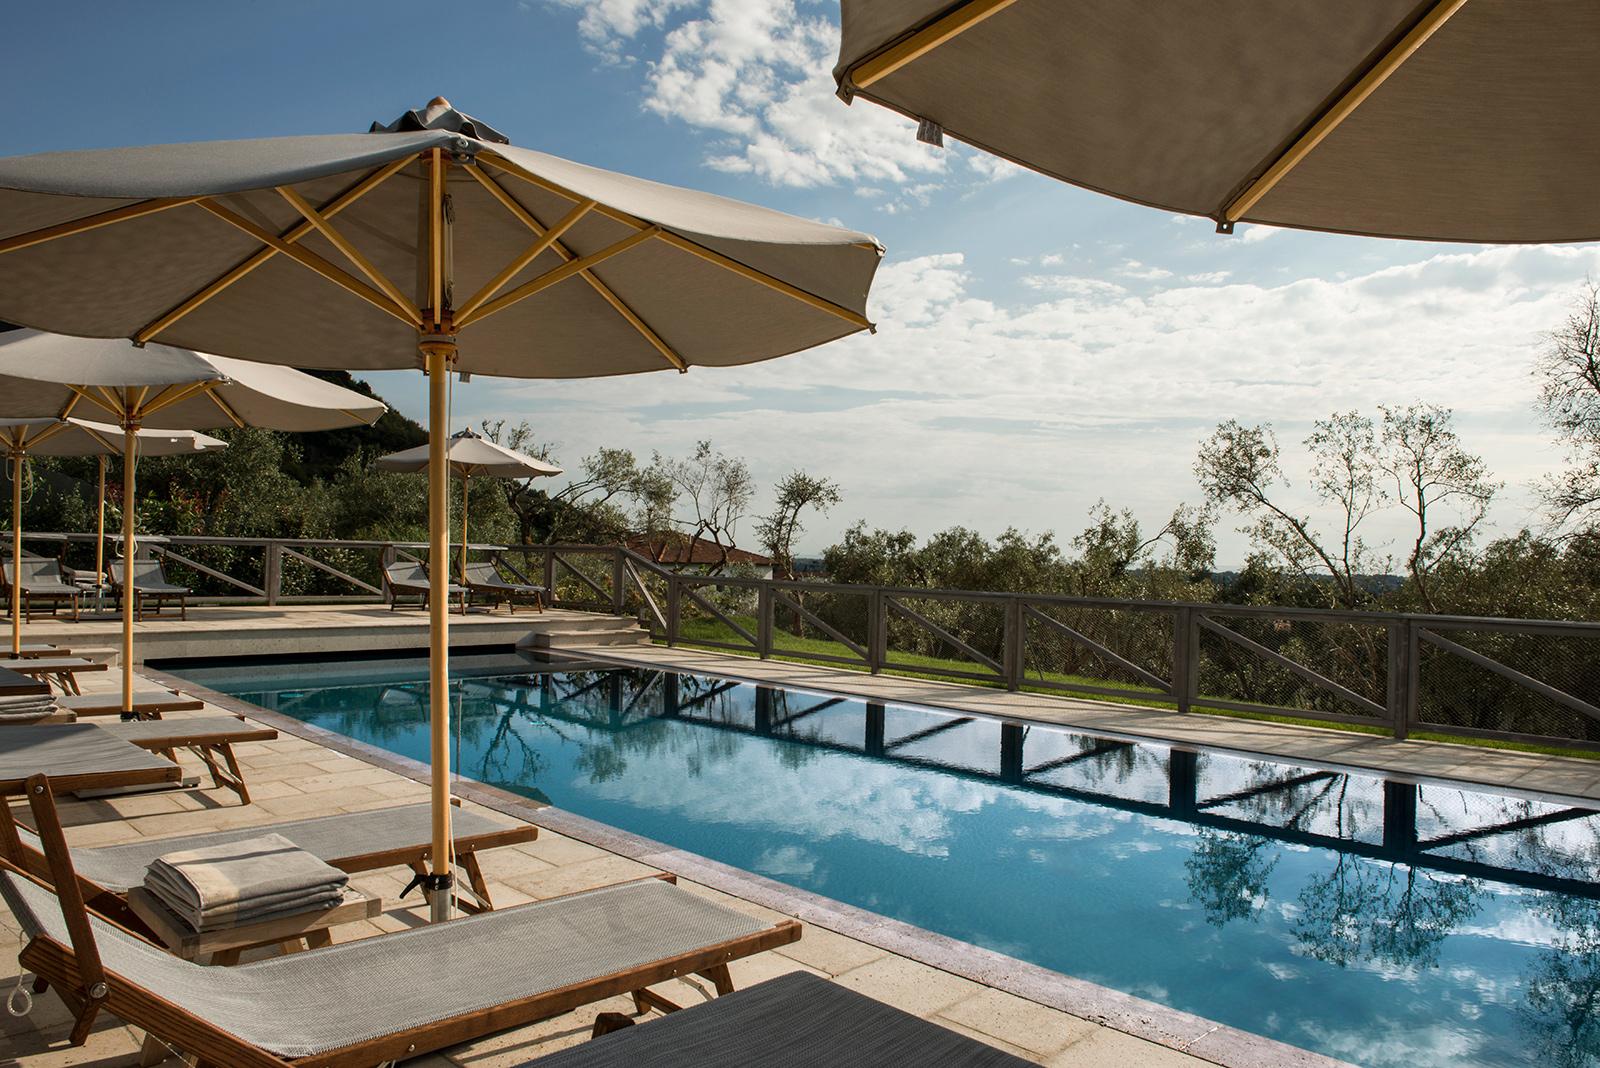 Gilda Forte dei Marmi | Warm season has already arrived at Villa Gilda